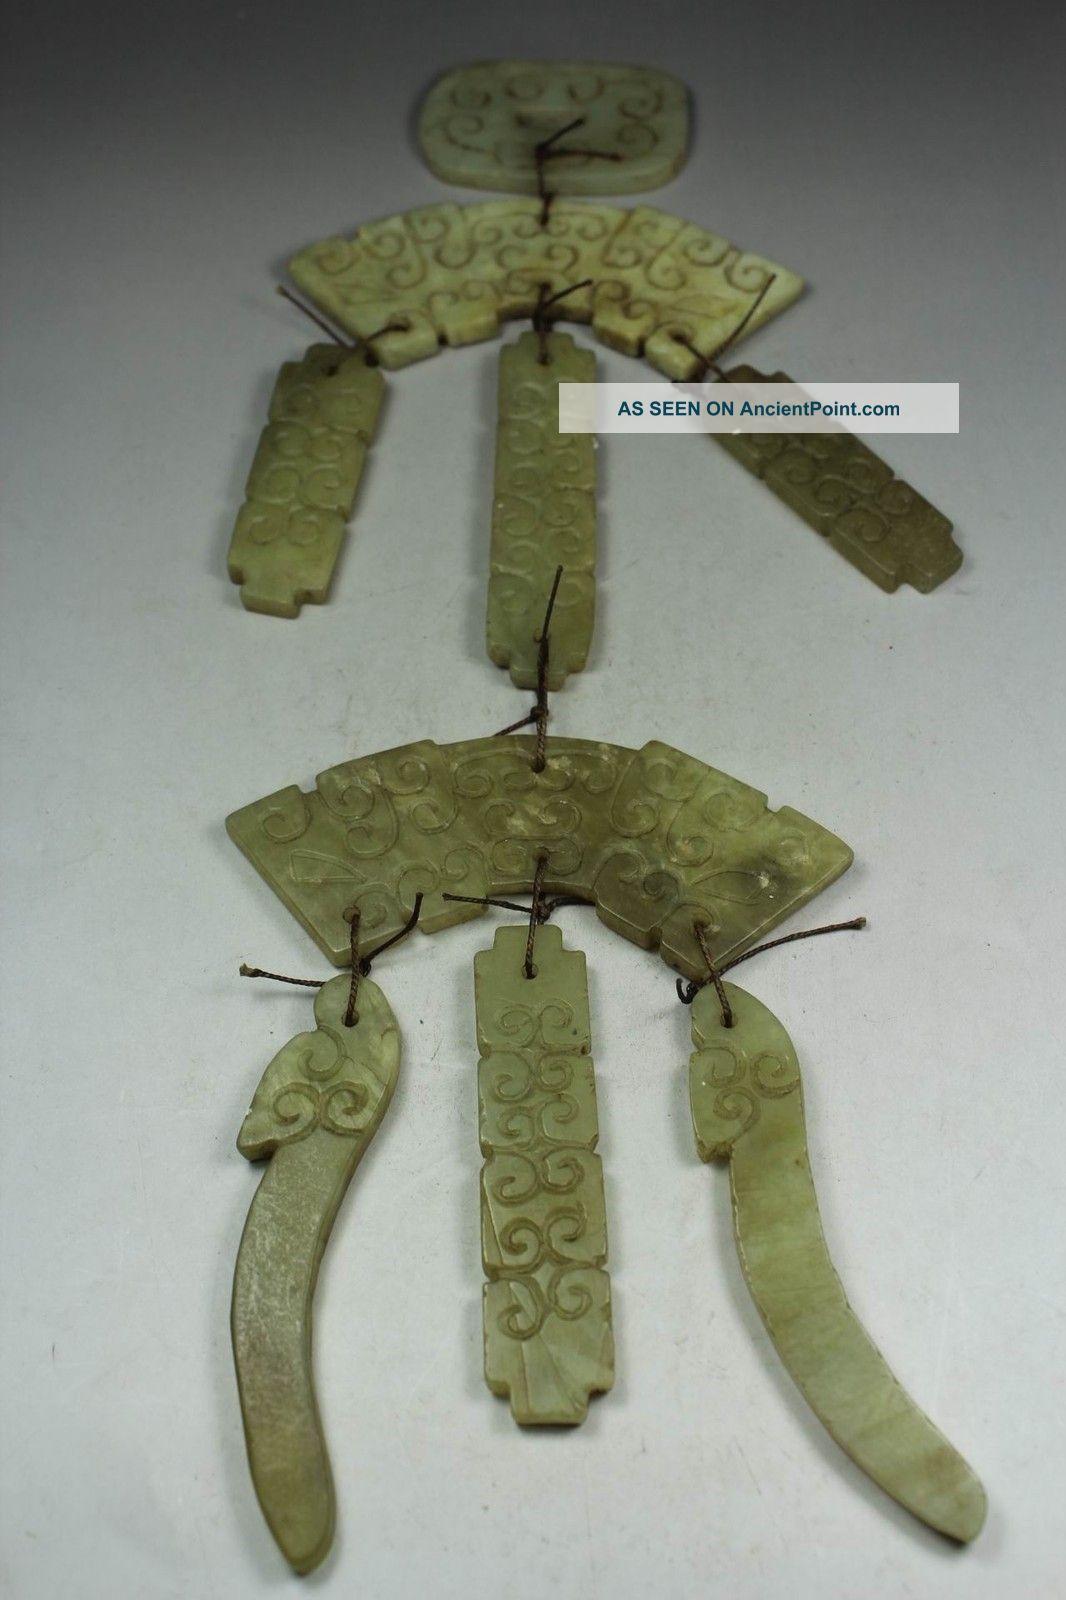 Chinese Handwork Carving Old Jade Aeolian Bells Decoration Uncategorized photo